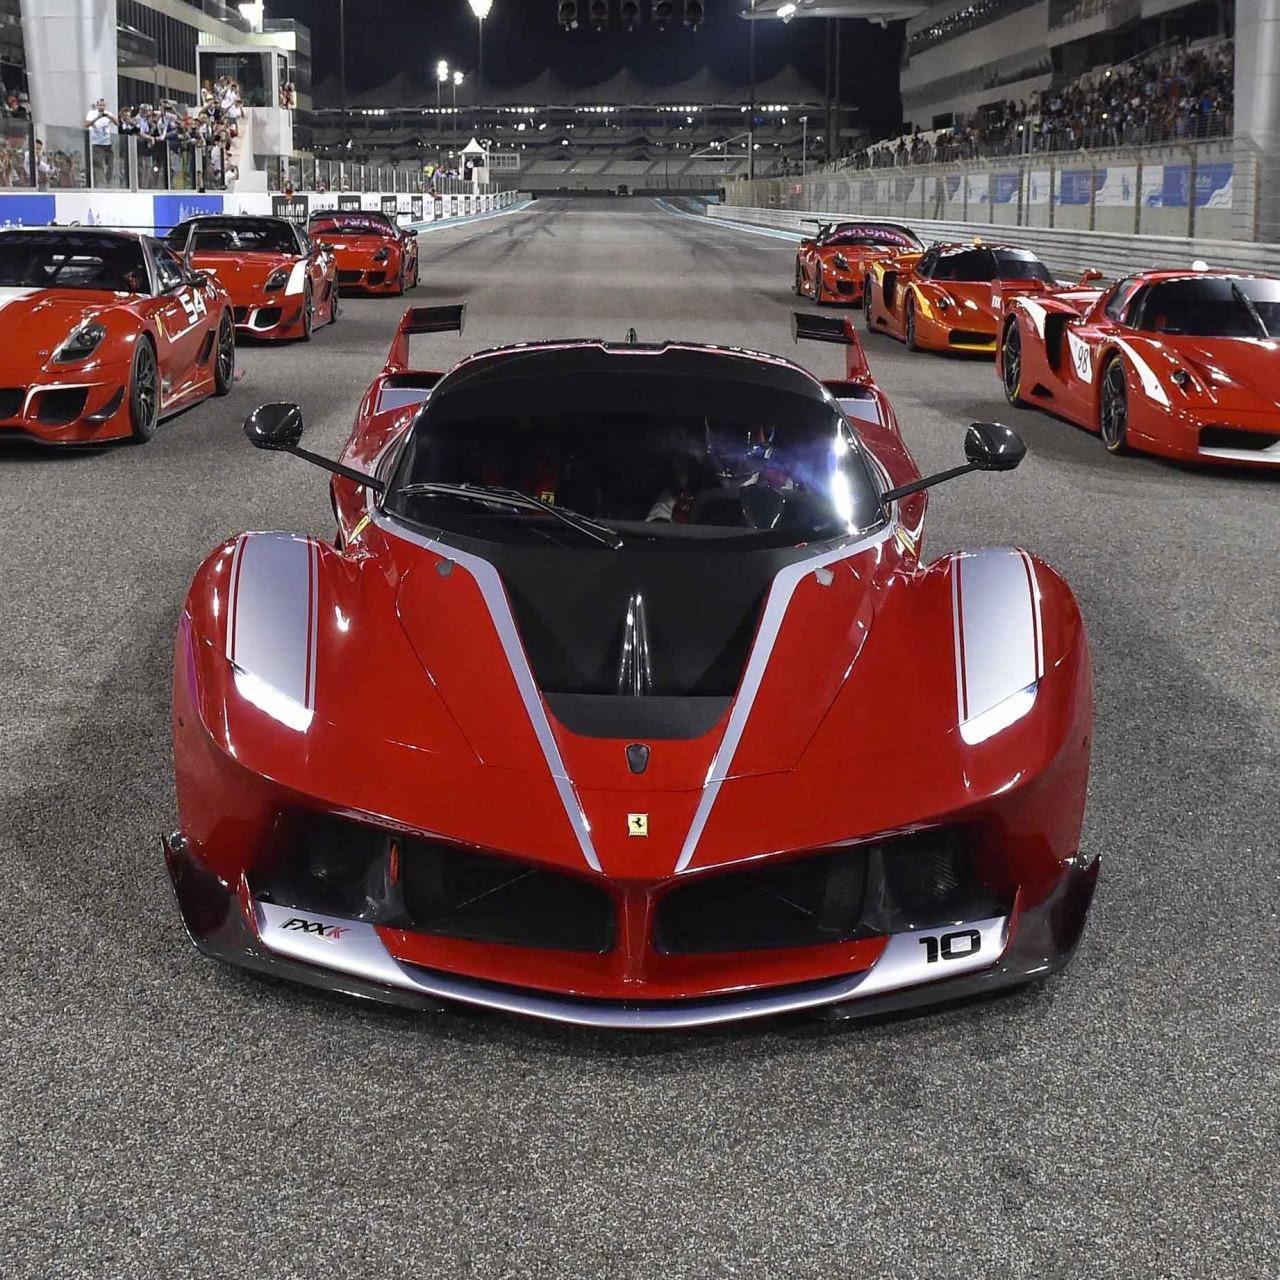 FXX K 4 Ferrari Fxx ουρλιάζουν στην πίστα Ferrari, Ferrari FXX K, videos